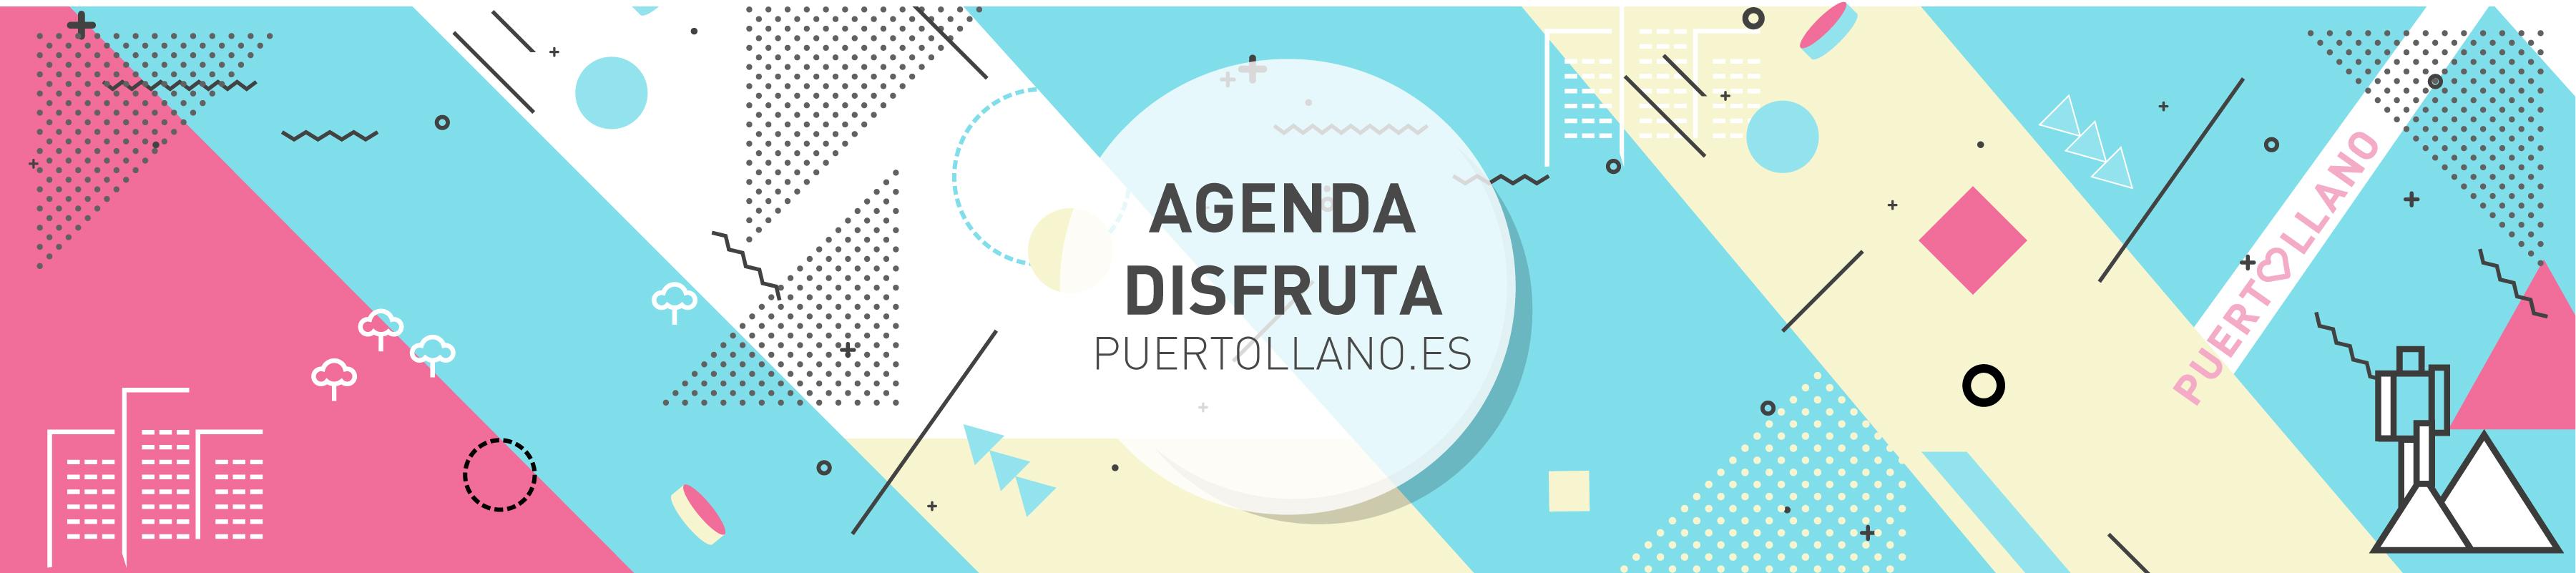 Banner_agenda_disfruta